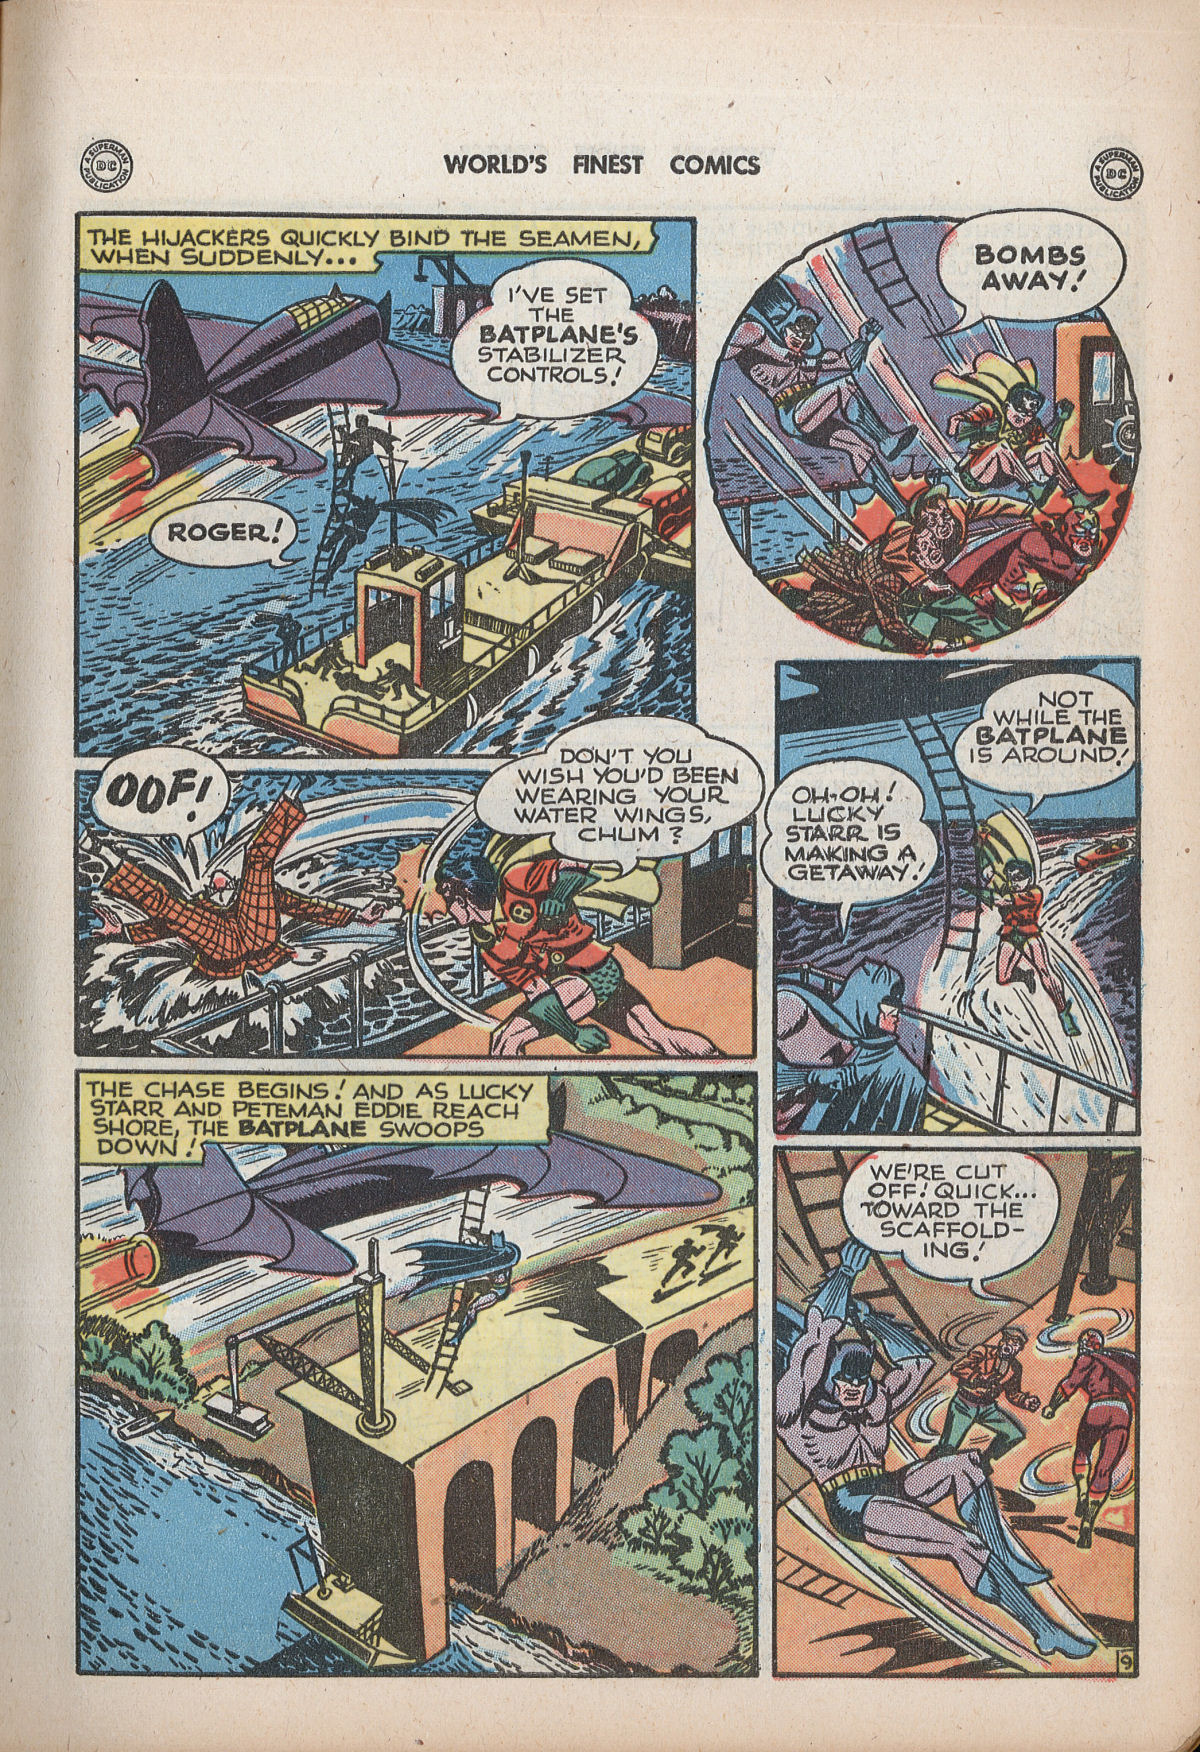 Read online World's Finest Comics comic -  Issue #32 - 11